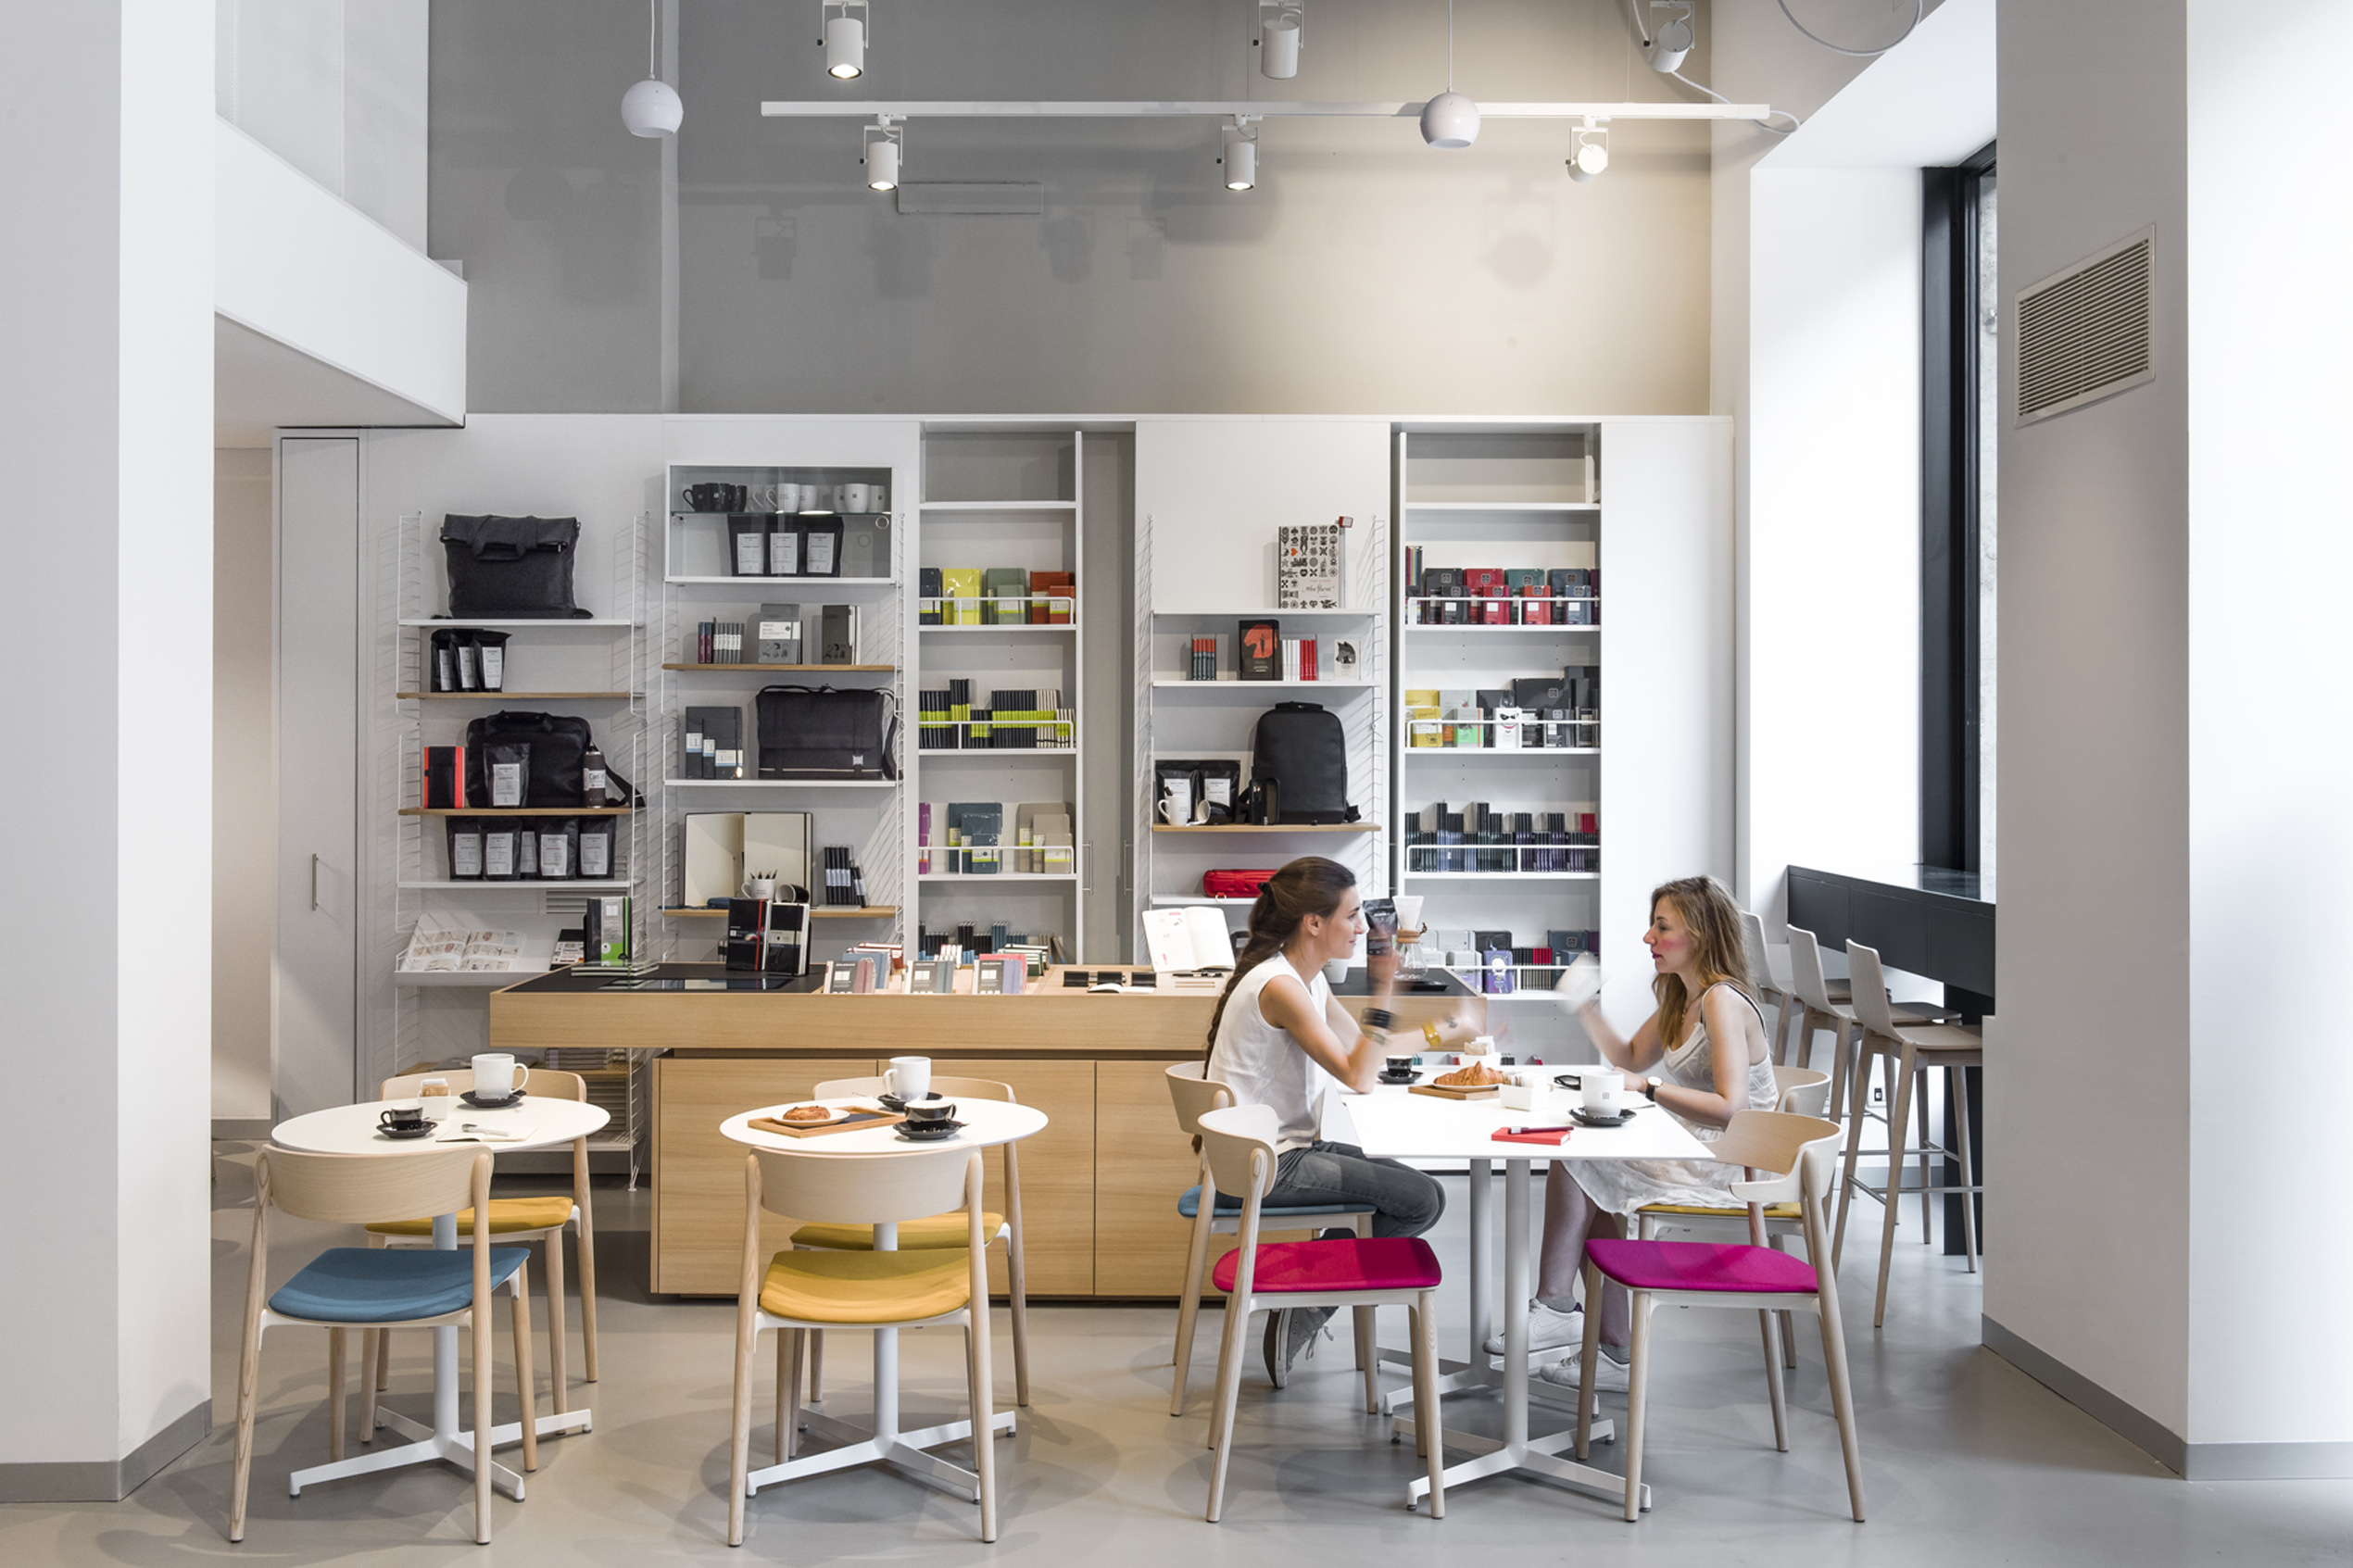 dans-ta-pub-moleskine-cafe-milan-inspiration-coffee-9